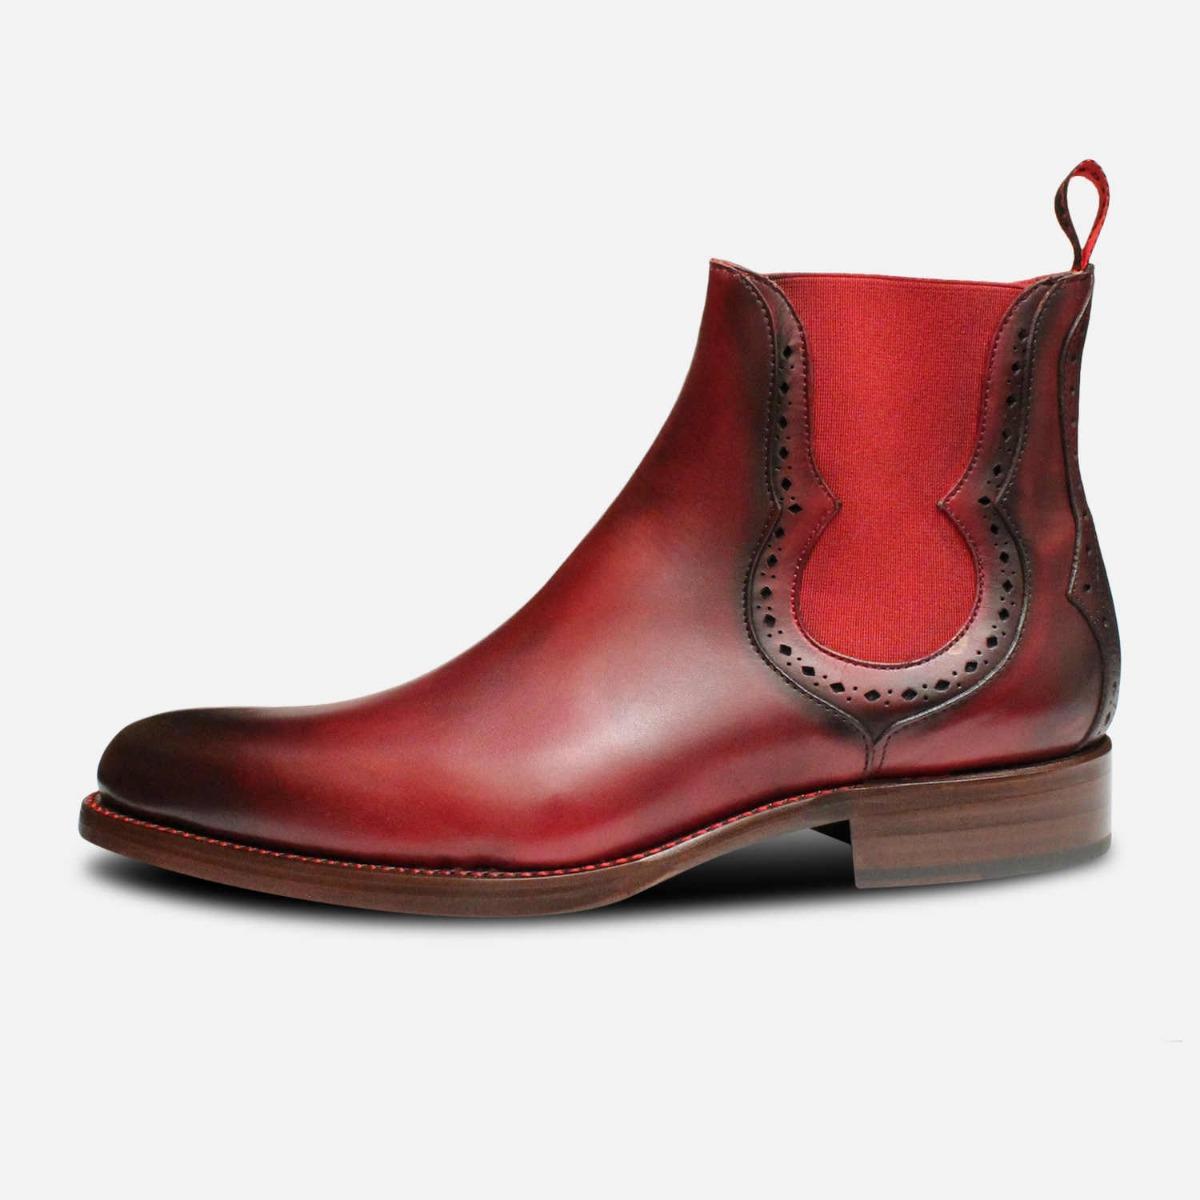 Jeffery West Dark Burgundy Red Elastic Chelsea Boots